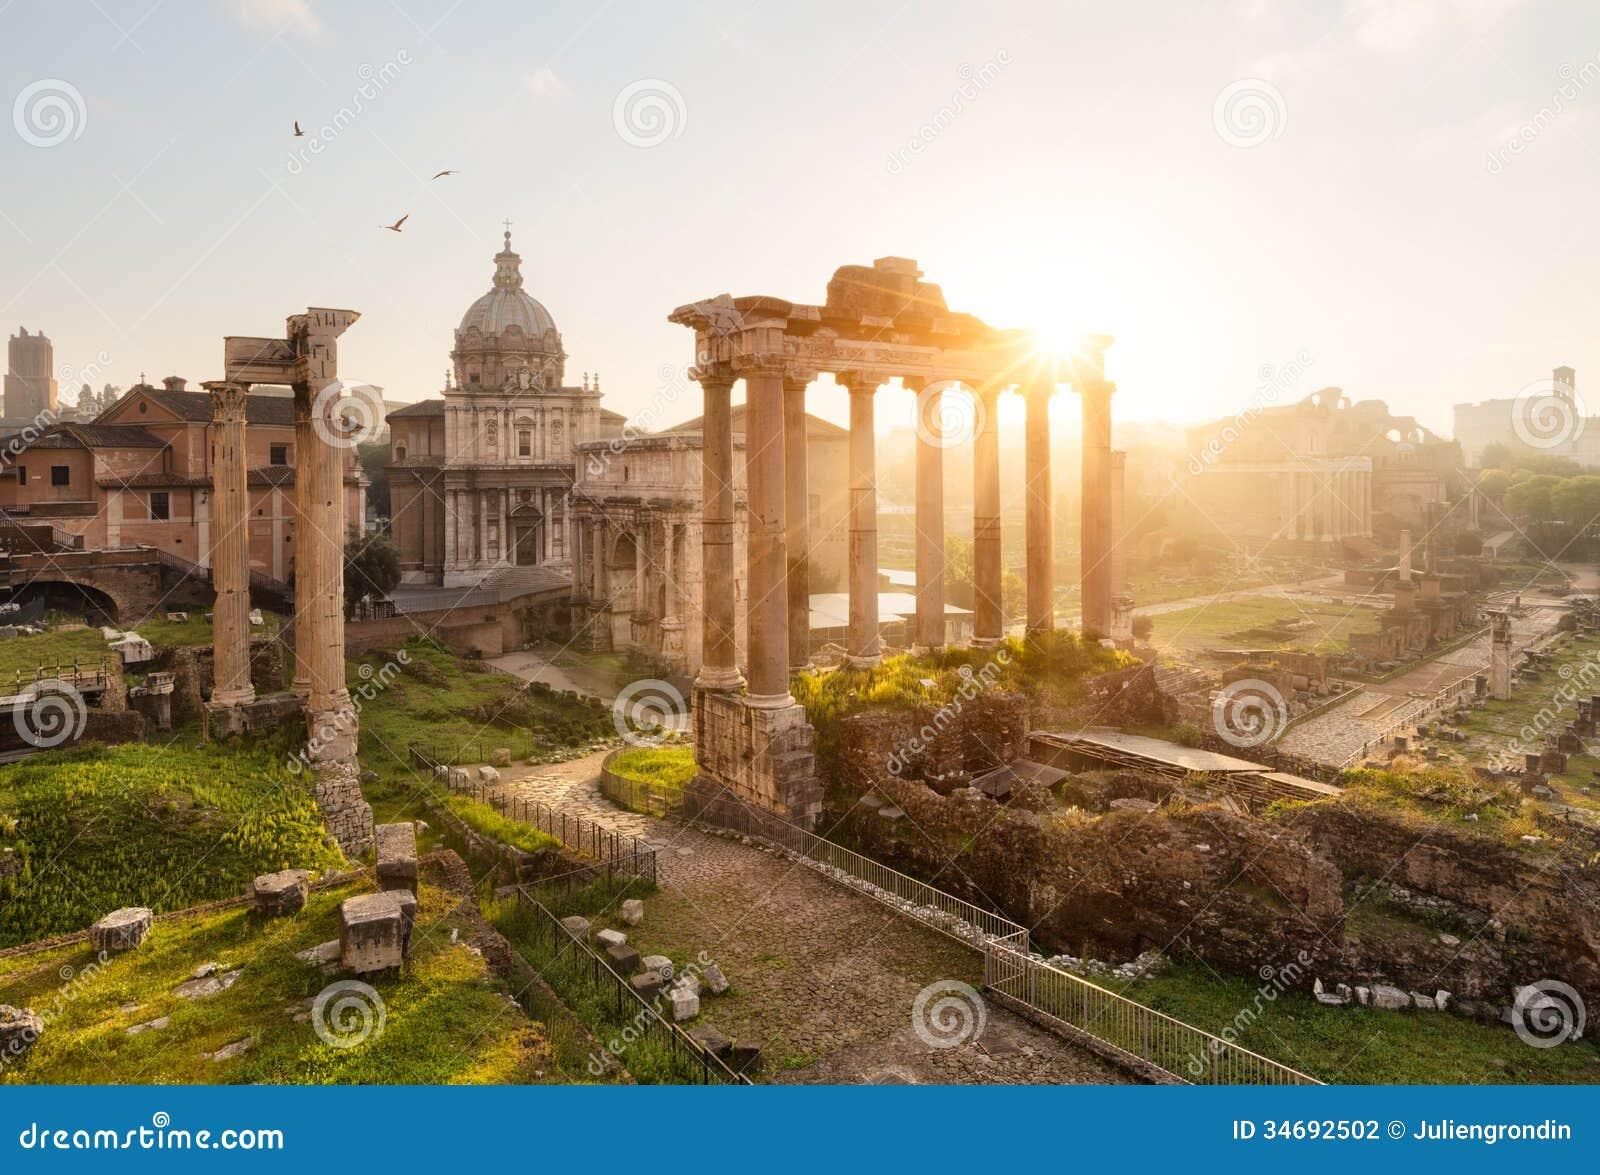 Rovine romane a Roma, forum